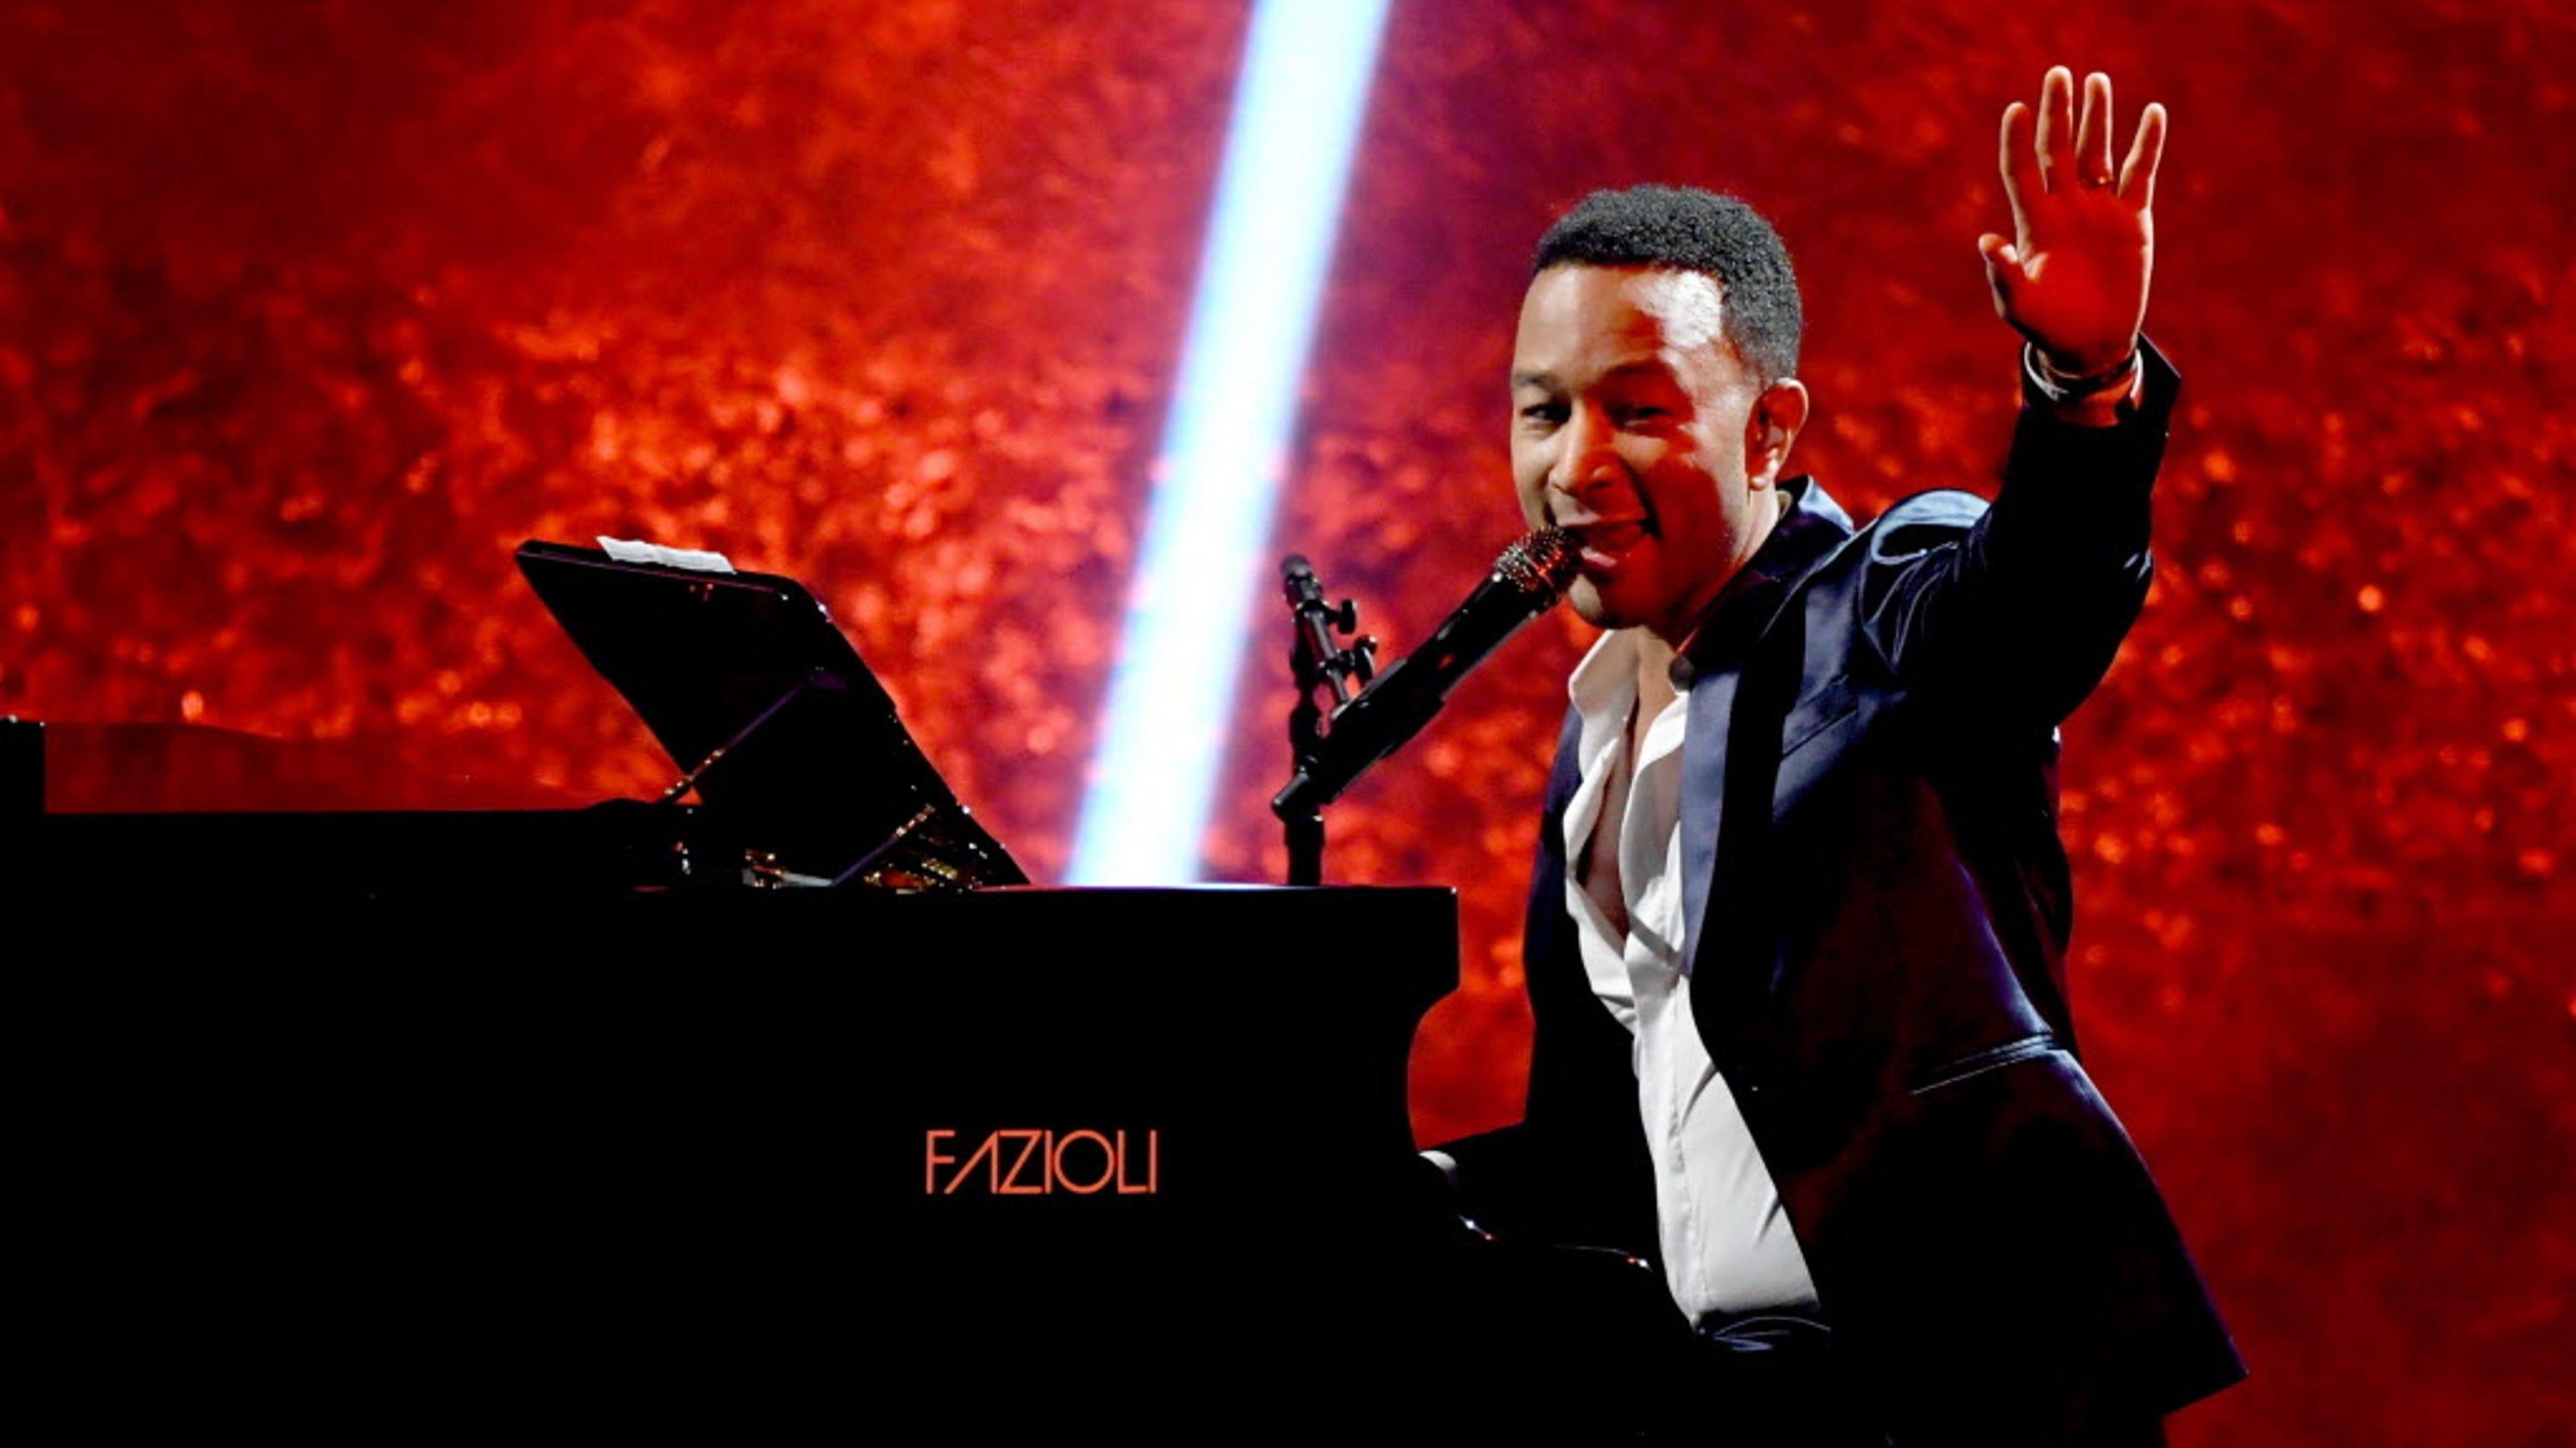 John Legend touring behind \'Legendary Christmas\' album, playing ...